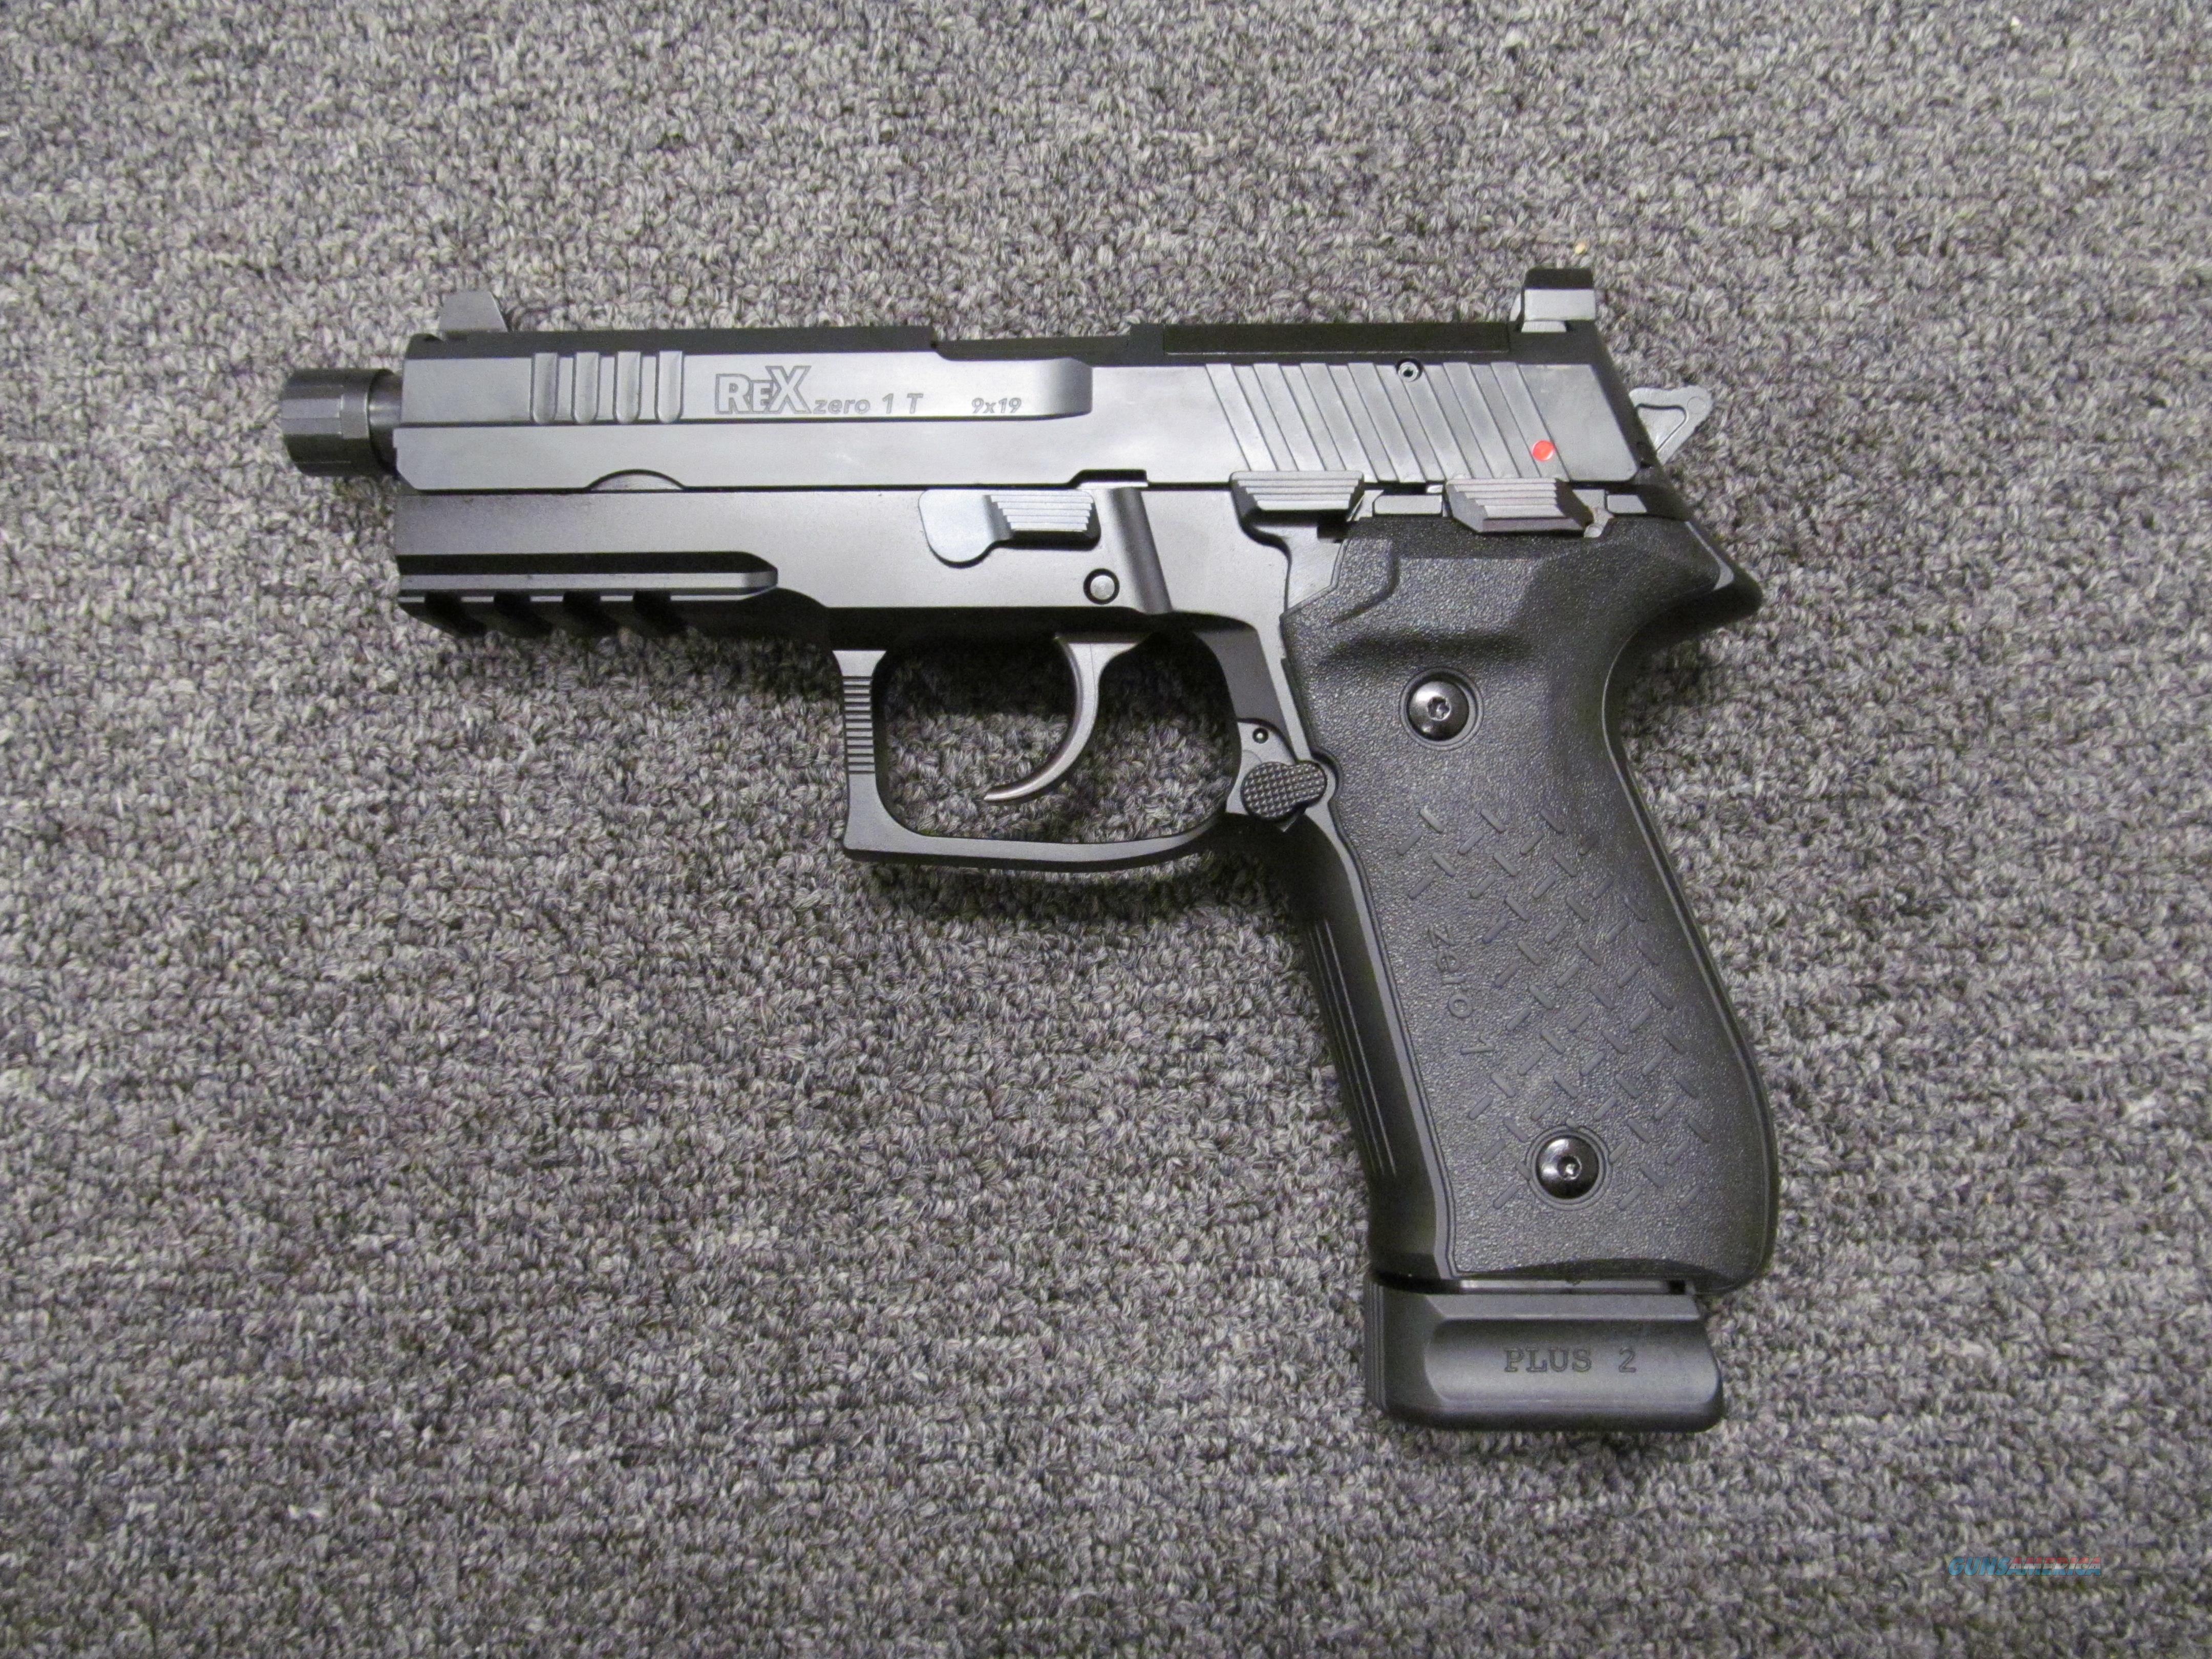 Arex/Fime Group Rex Zero 1T 9mm  Guns > Pistols > FIME Group Pistols > Rex Zero 1